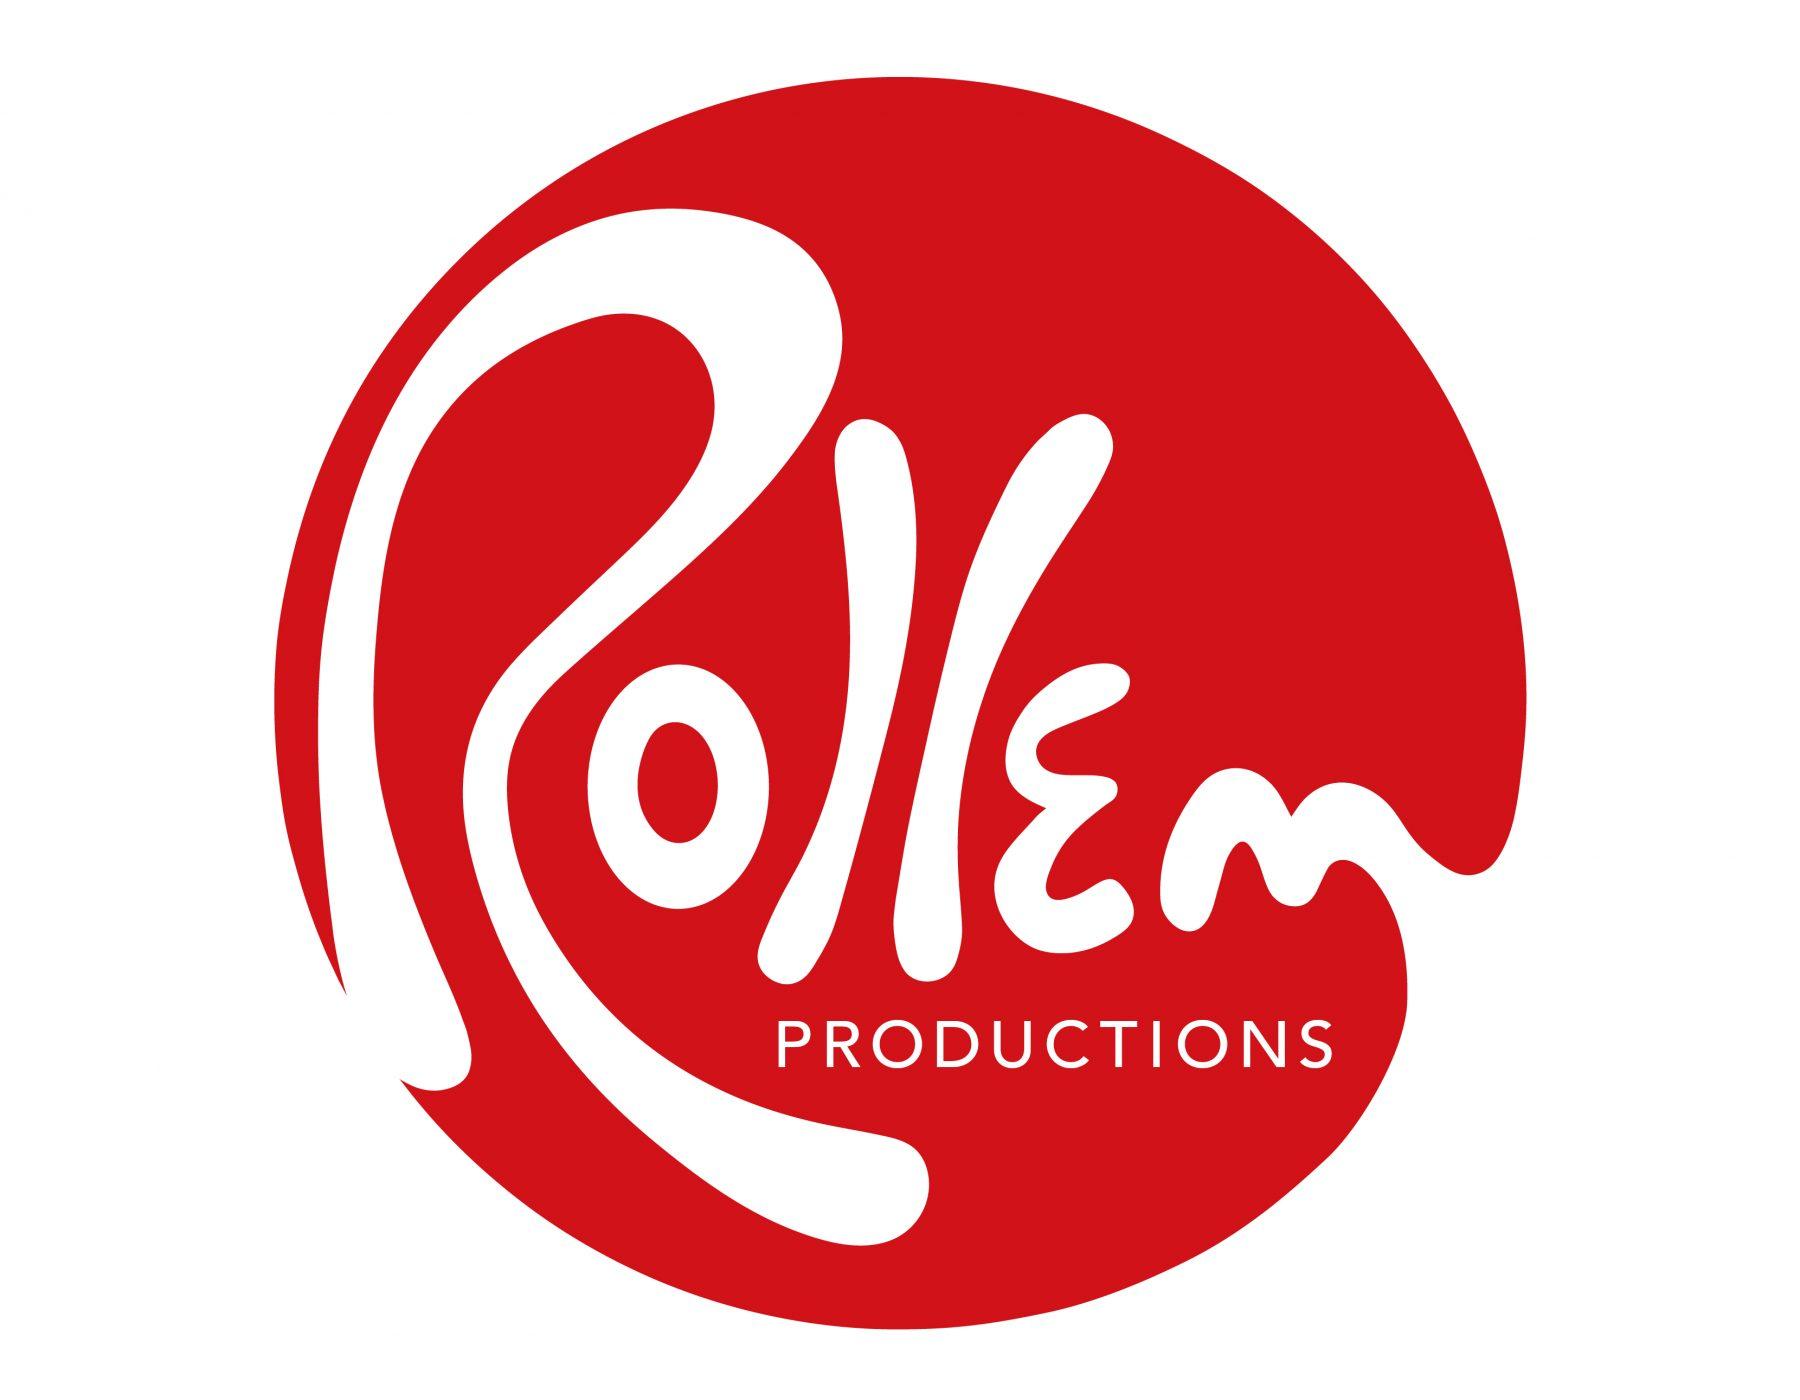 Rollem Productions